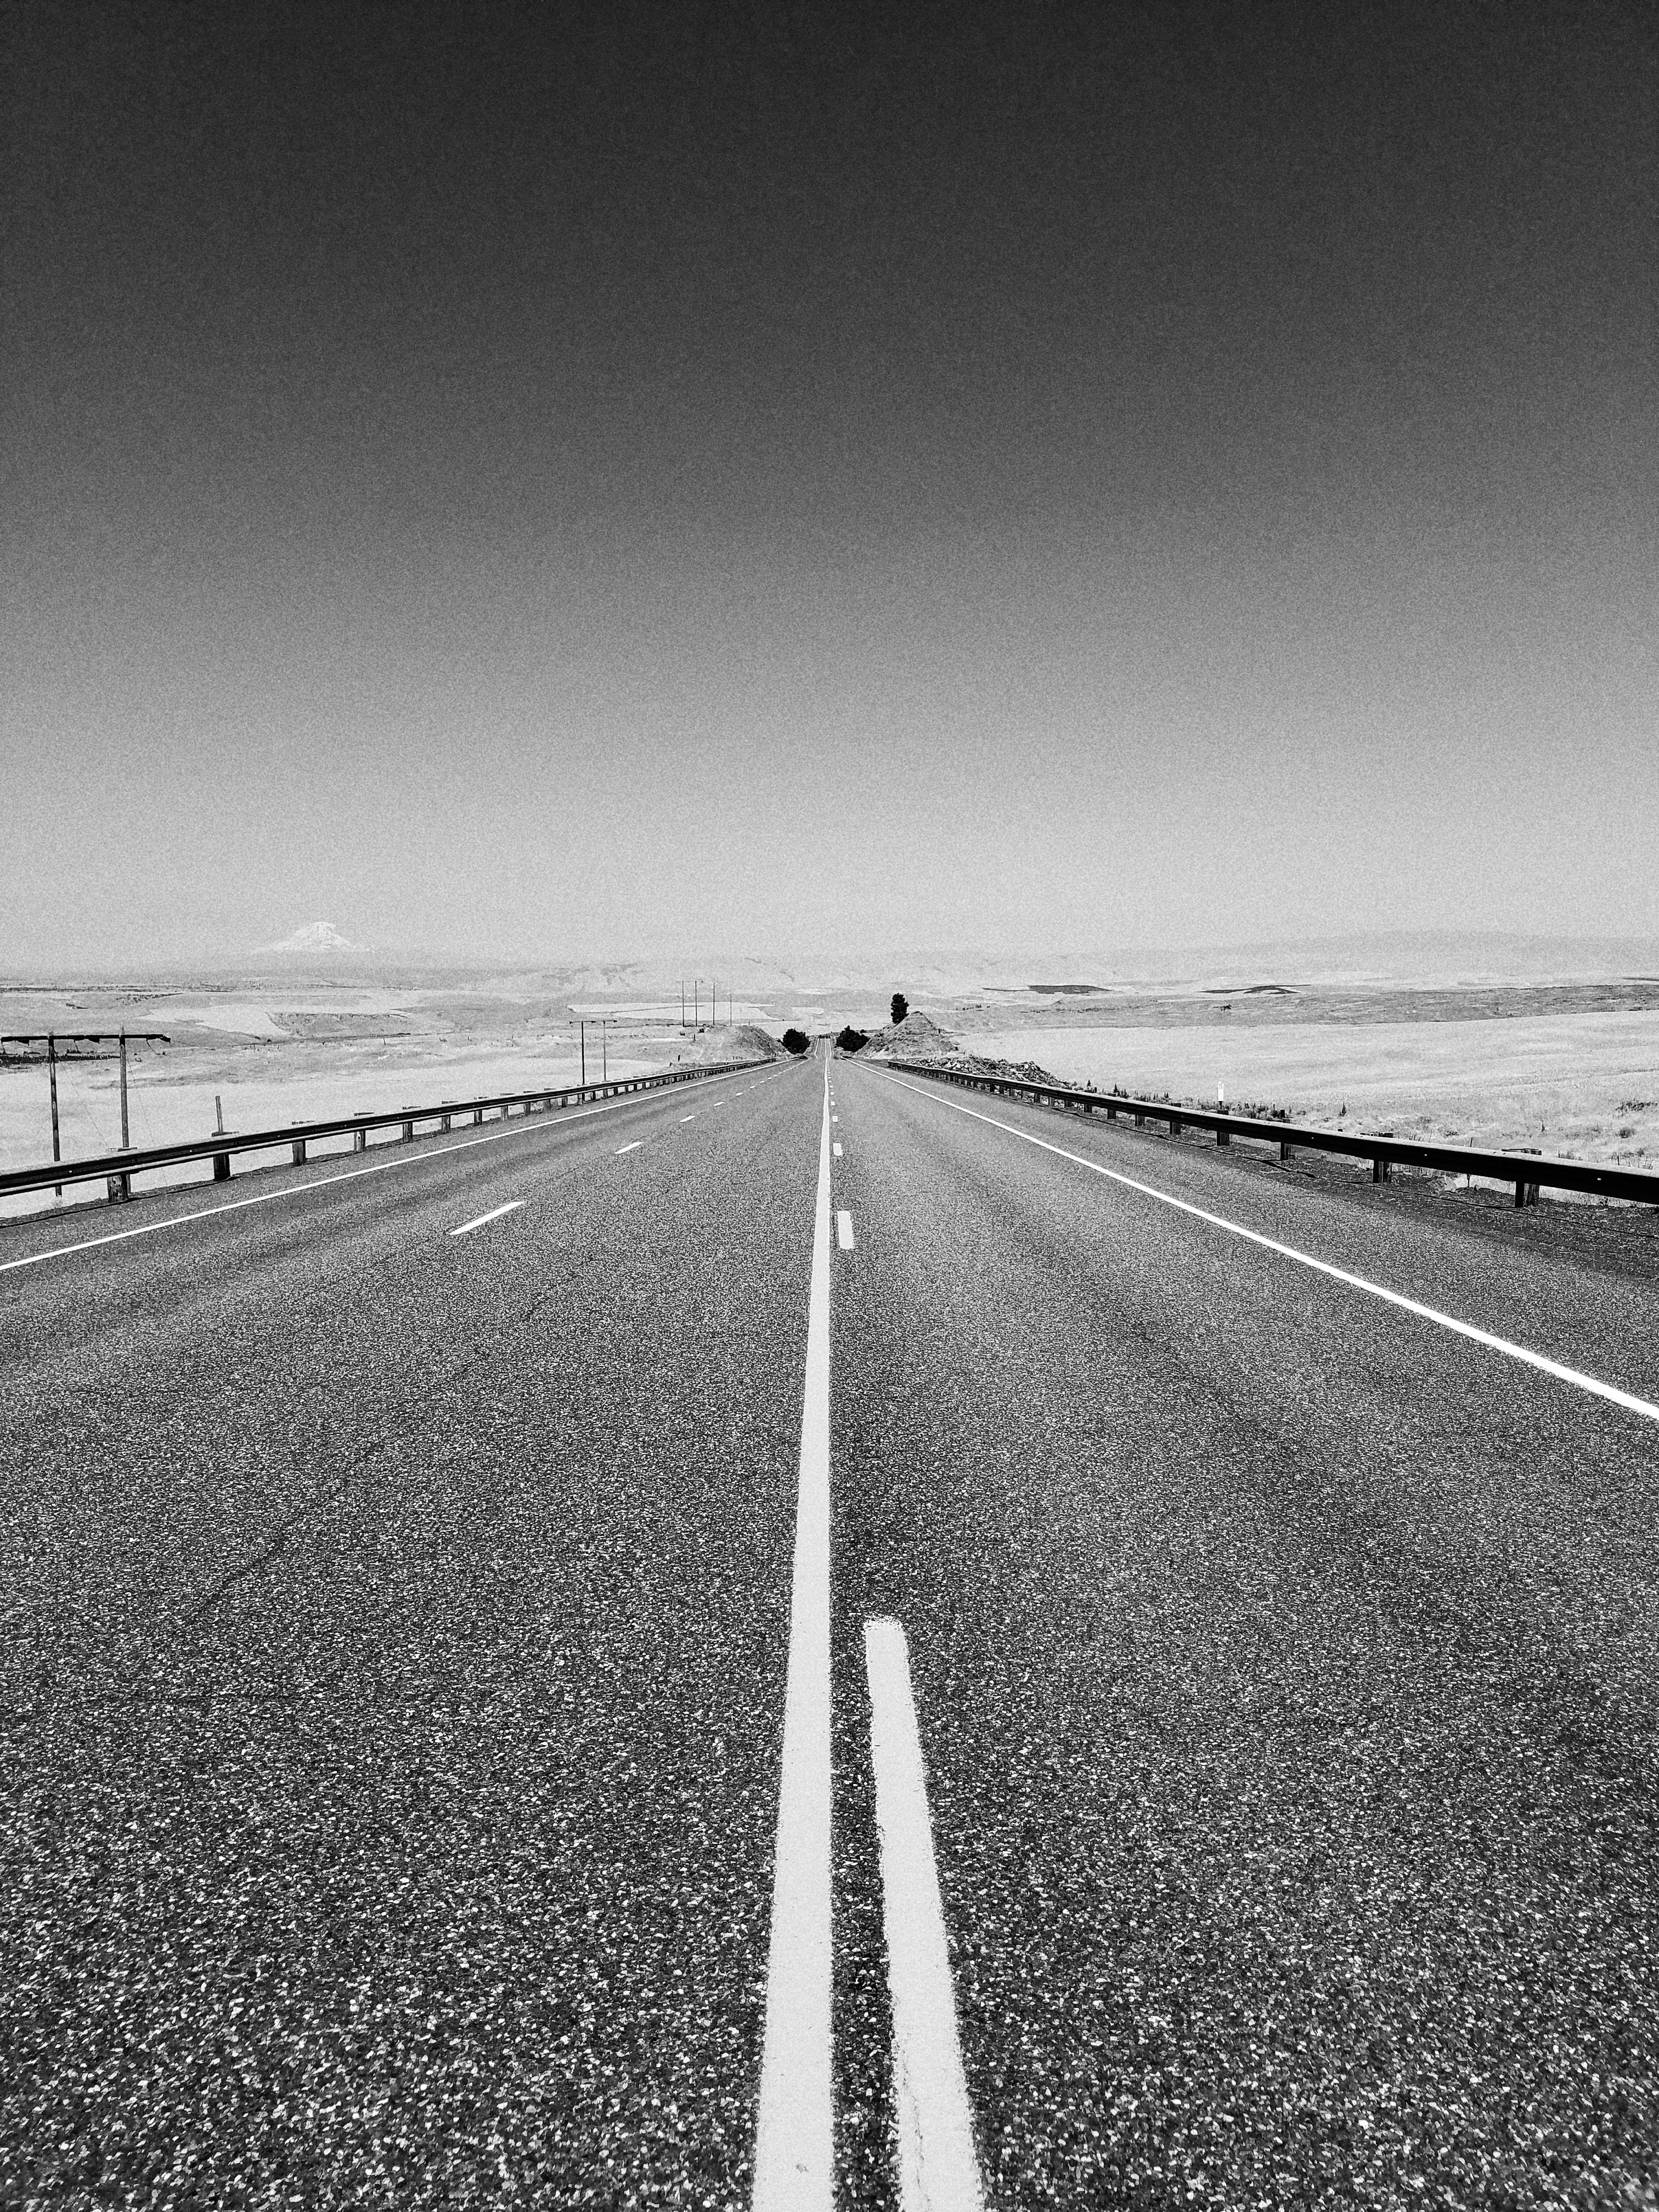 grayscale photo of concrete road